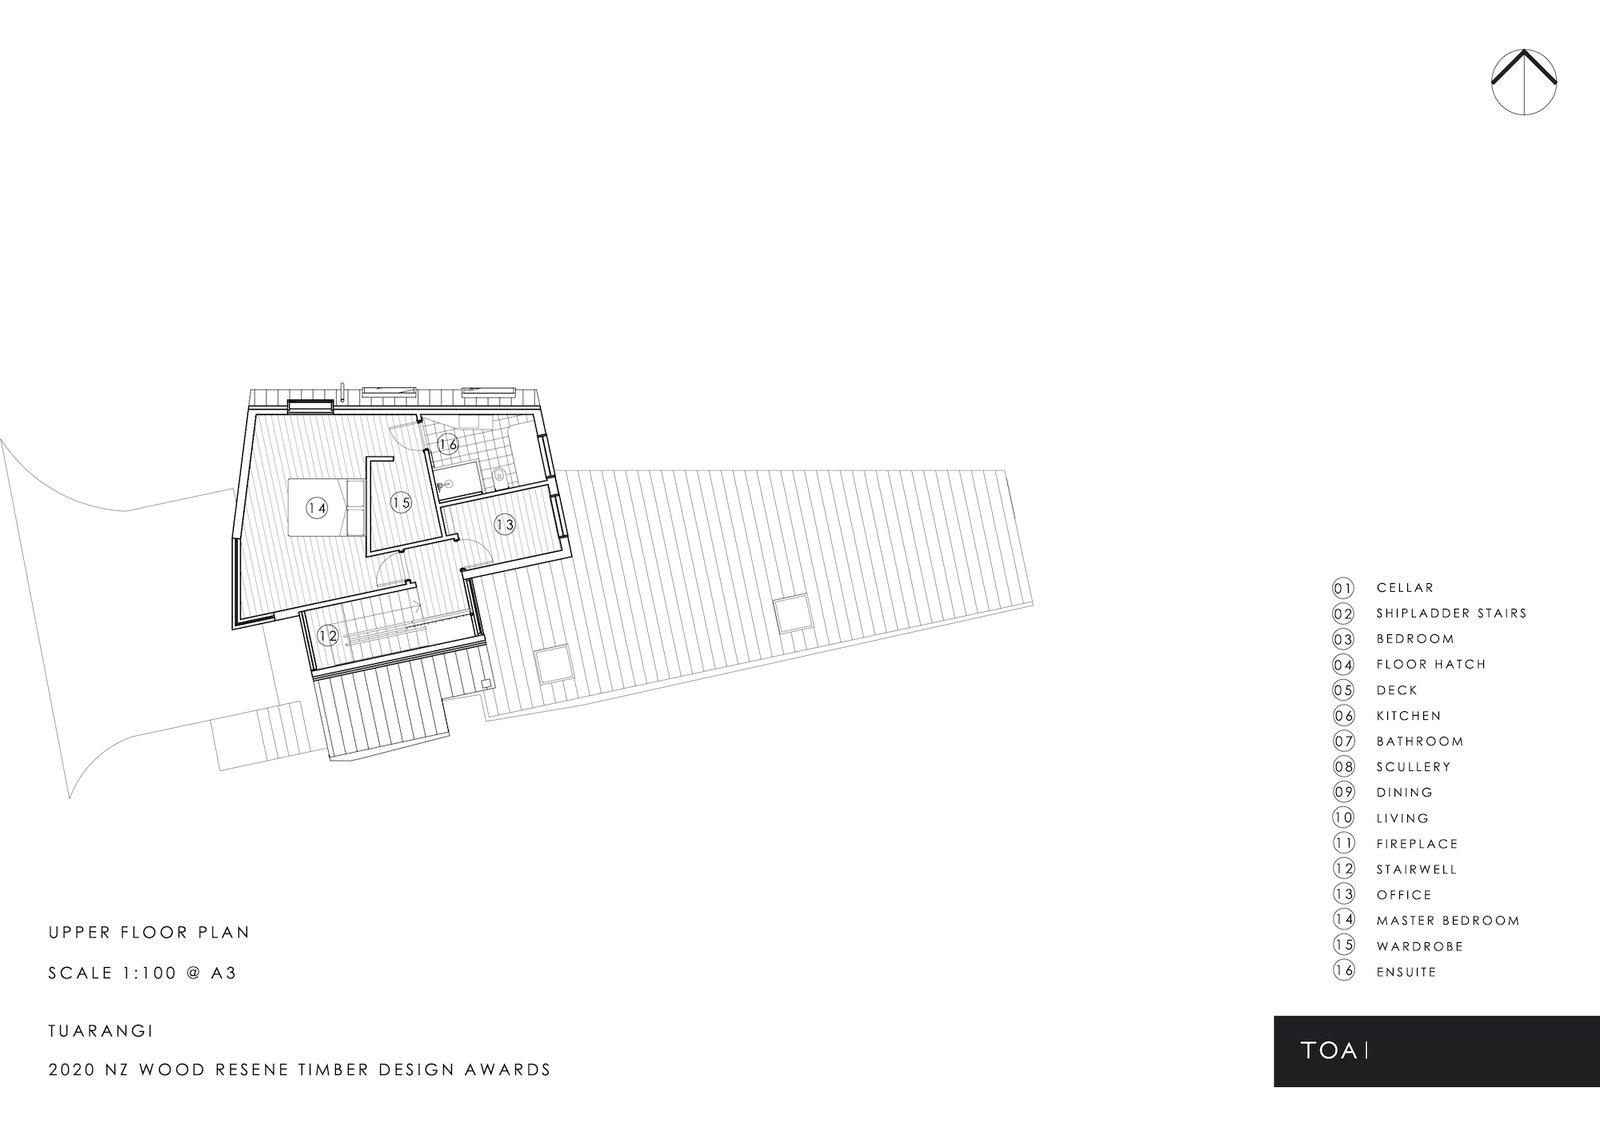 Upper floor plan of Tuarangi House by TOA Architects.